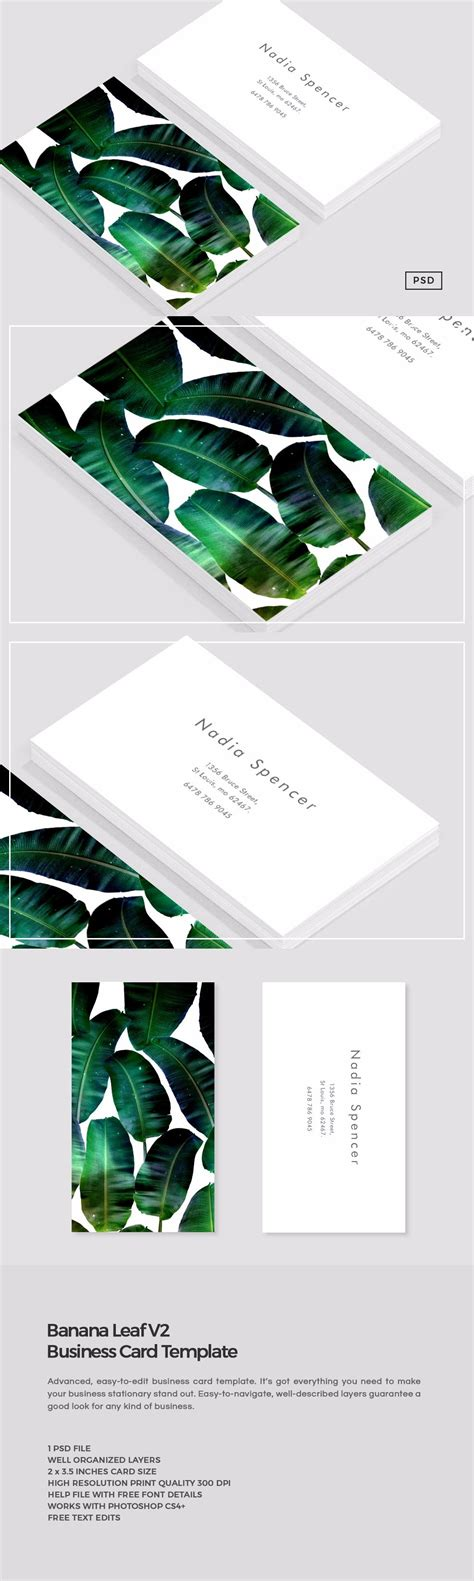 leaf name card template banana leaf business card template business card